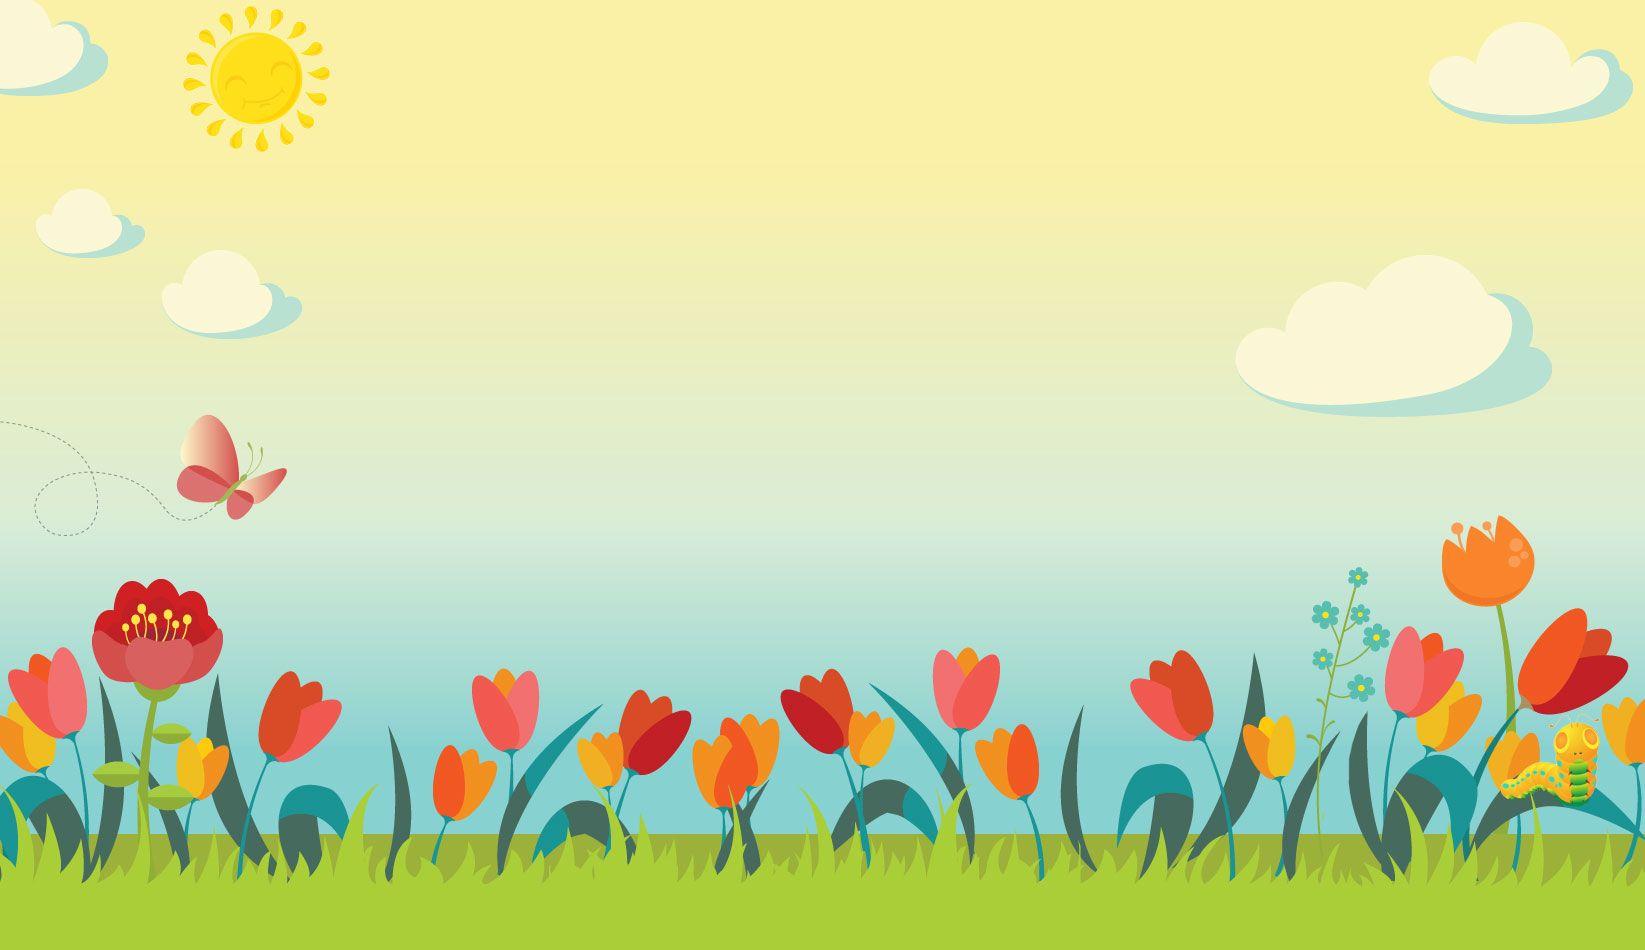 50 Preschool Wallpapers   Download at WallpaperBro 1645x950